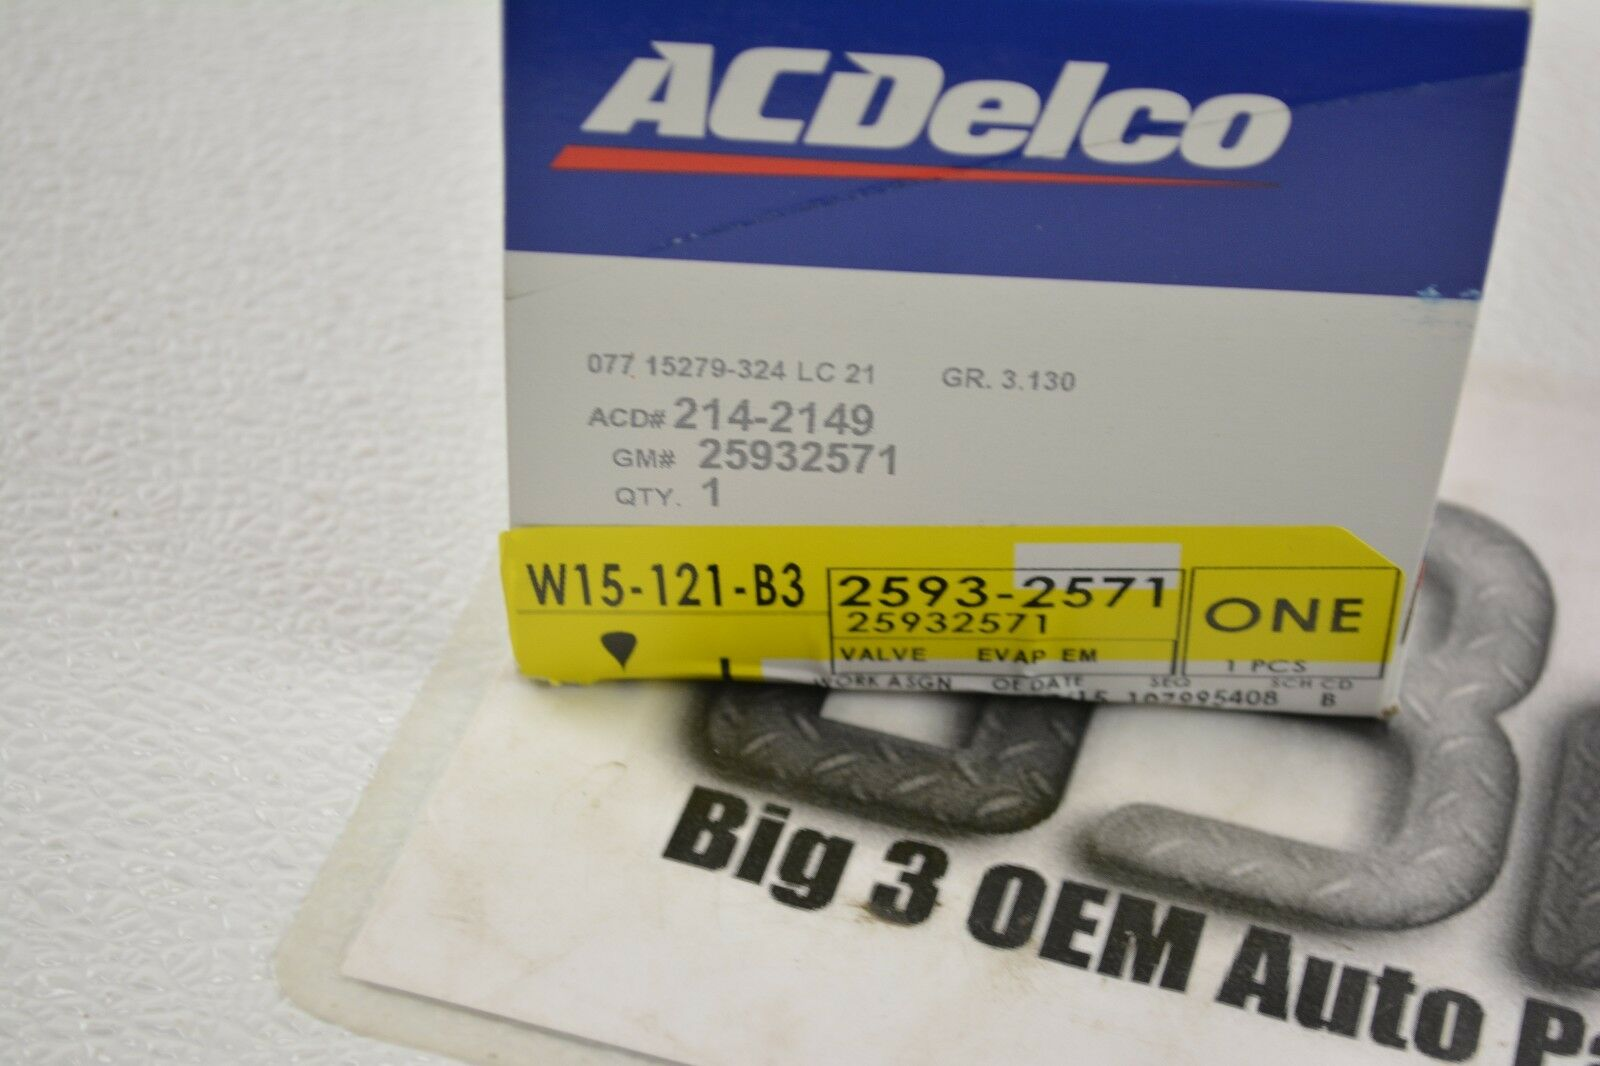 ACDelco 214-2149 Original GM Vapor Canister Purge Solenoid Valve new OE 25932571